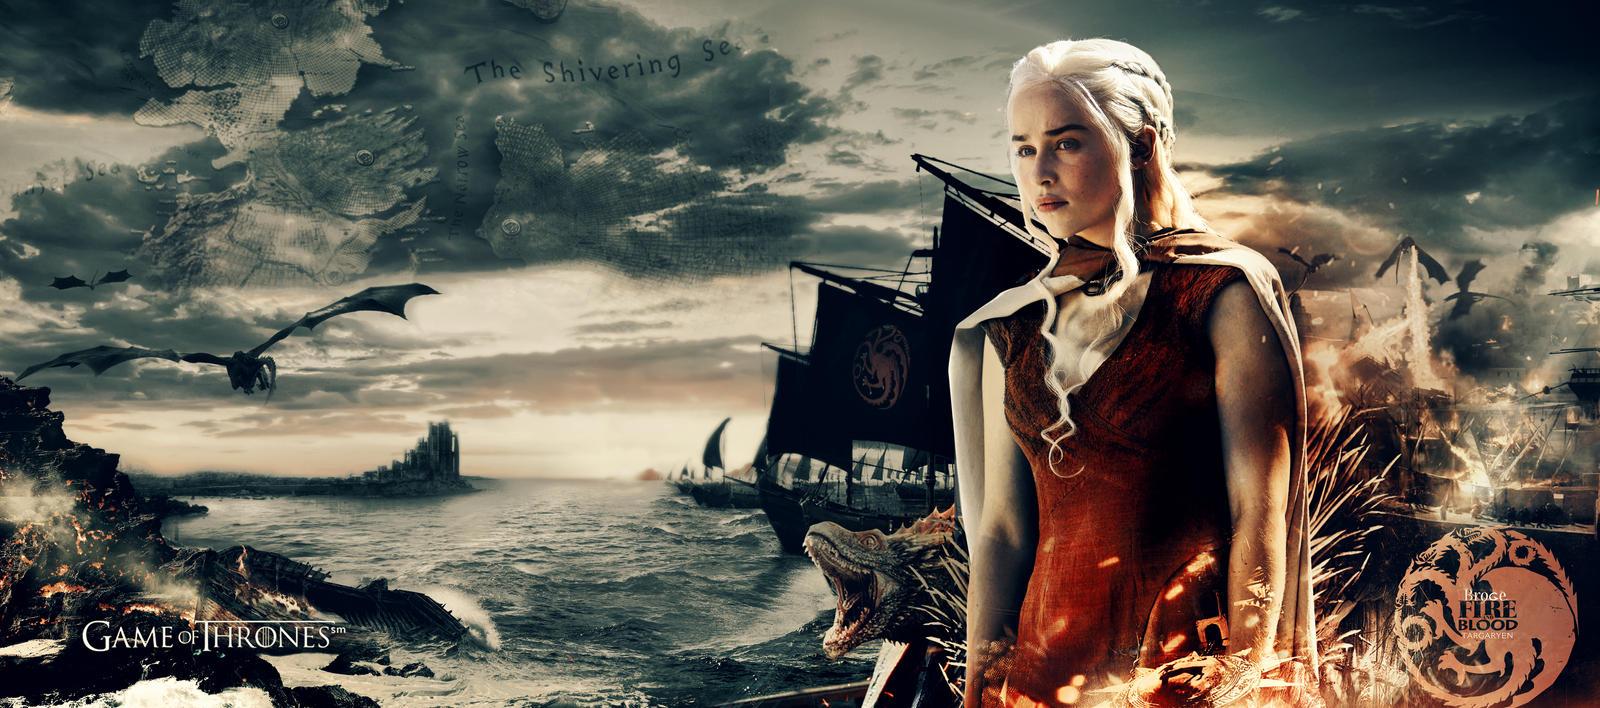 khaleesi wallpaper game - photo #6